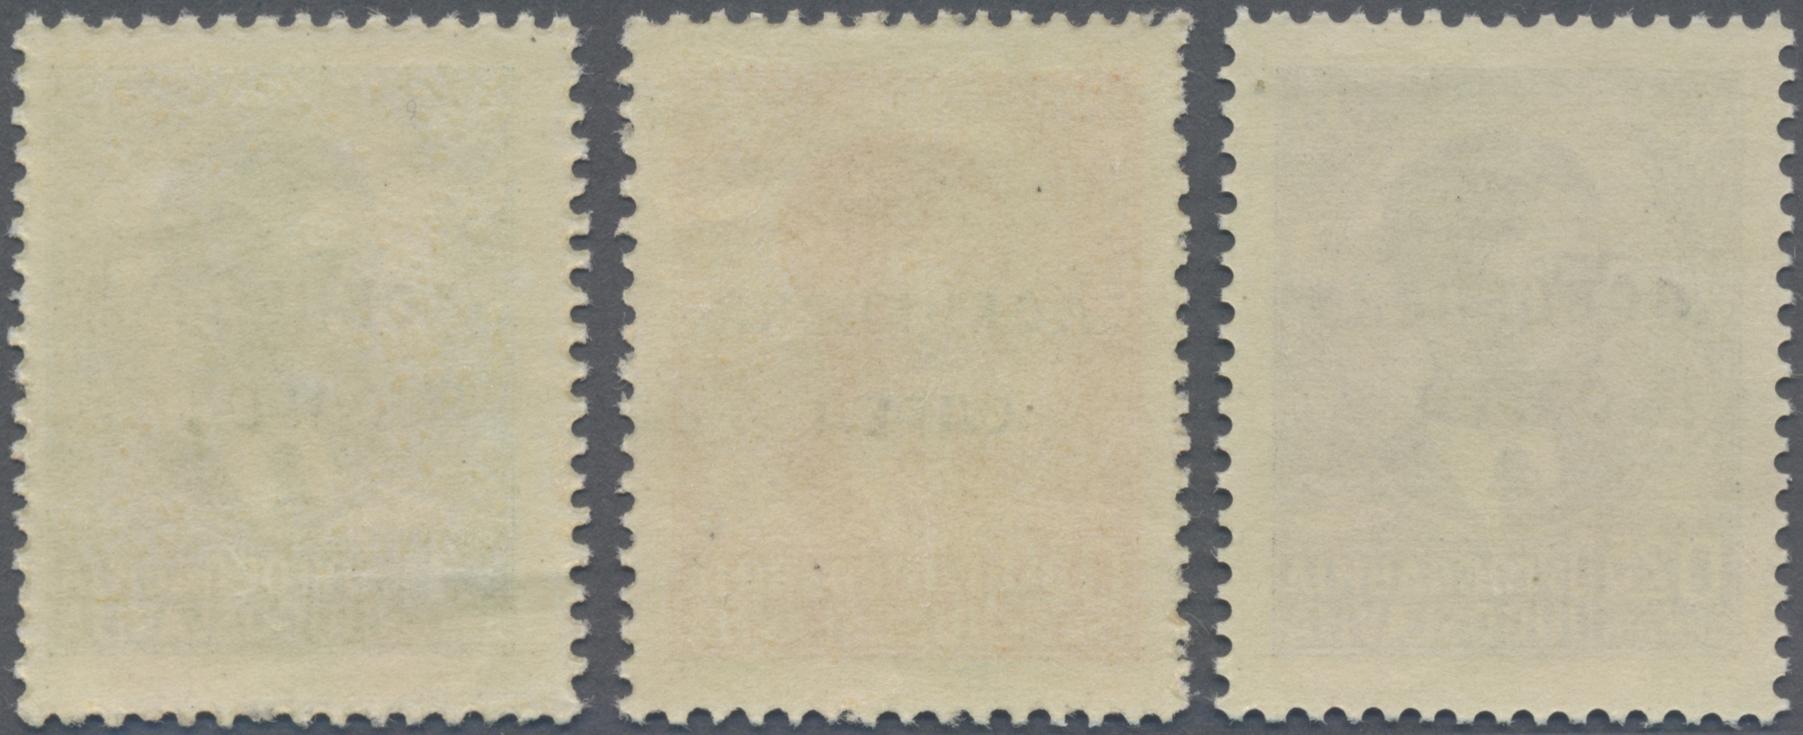 Lot 09097 - Italienische Besetzung 1941/43 - Montenegro  -  Auktionshaus Christoph Gärtner GmbH & Co. KG Sale #48 The Single Lots Philatelie